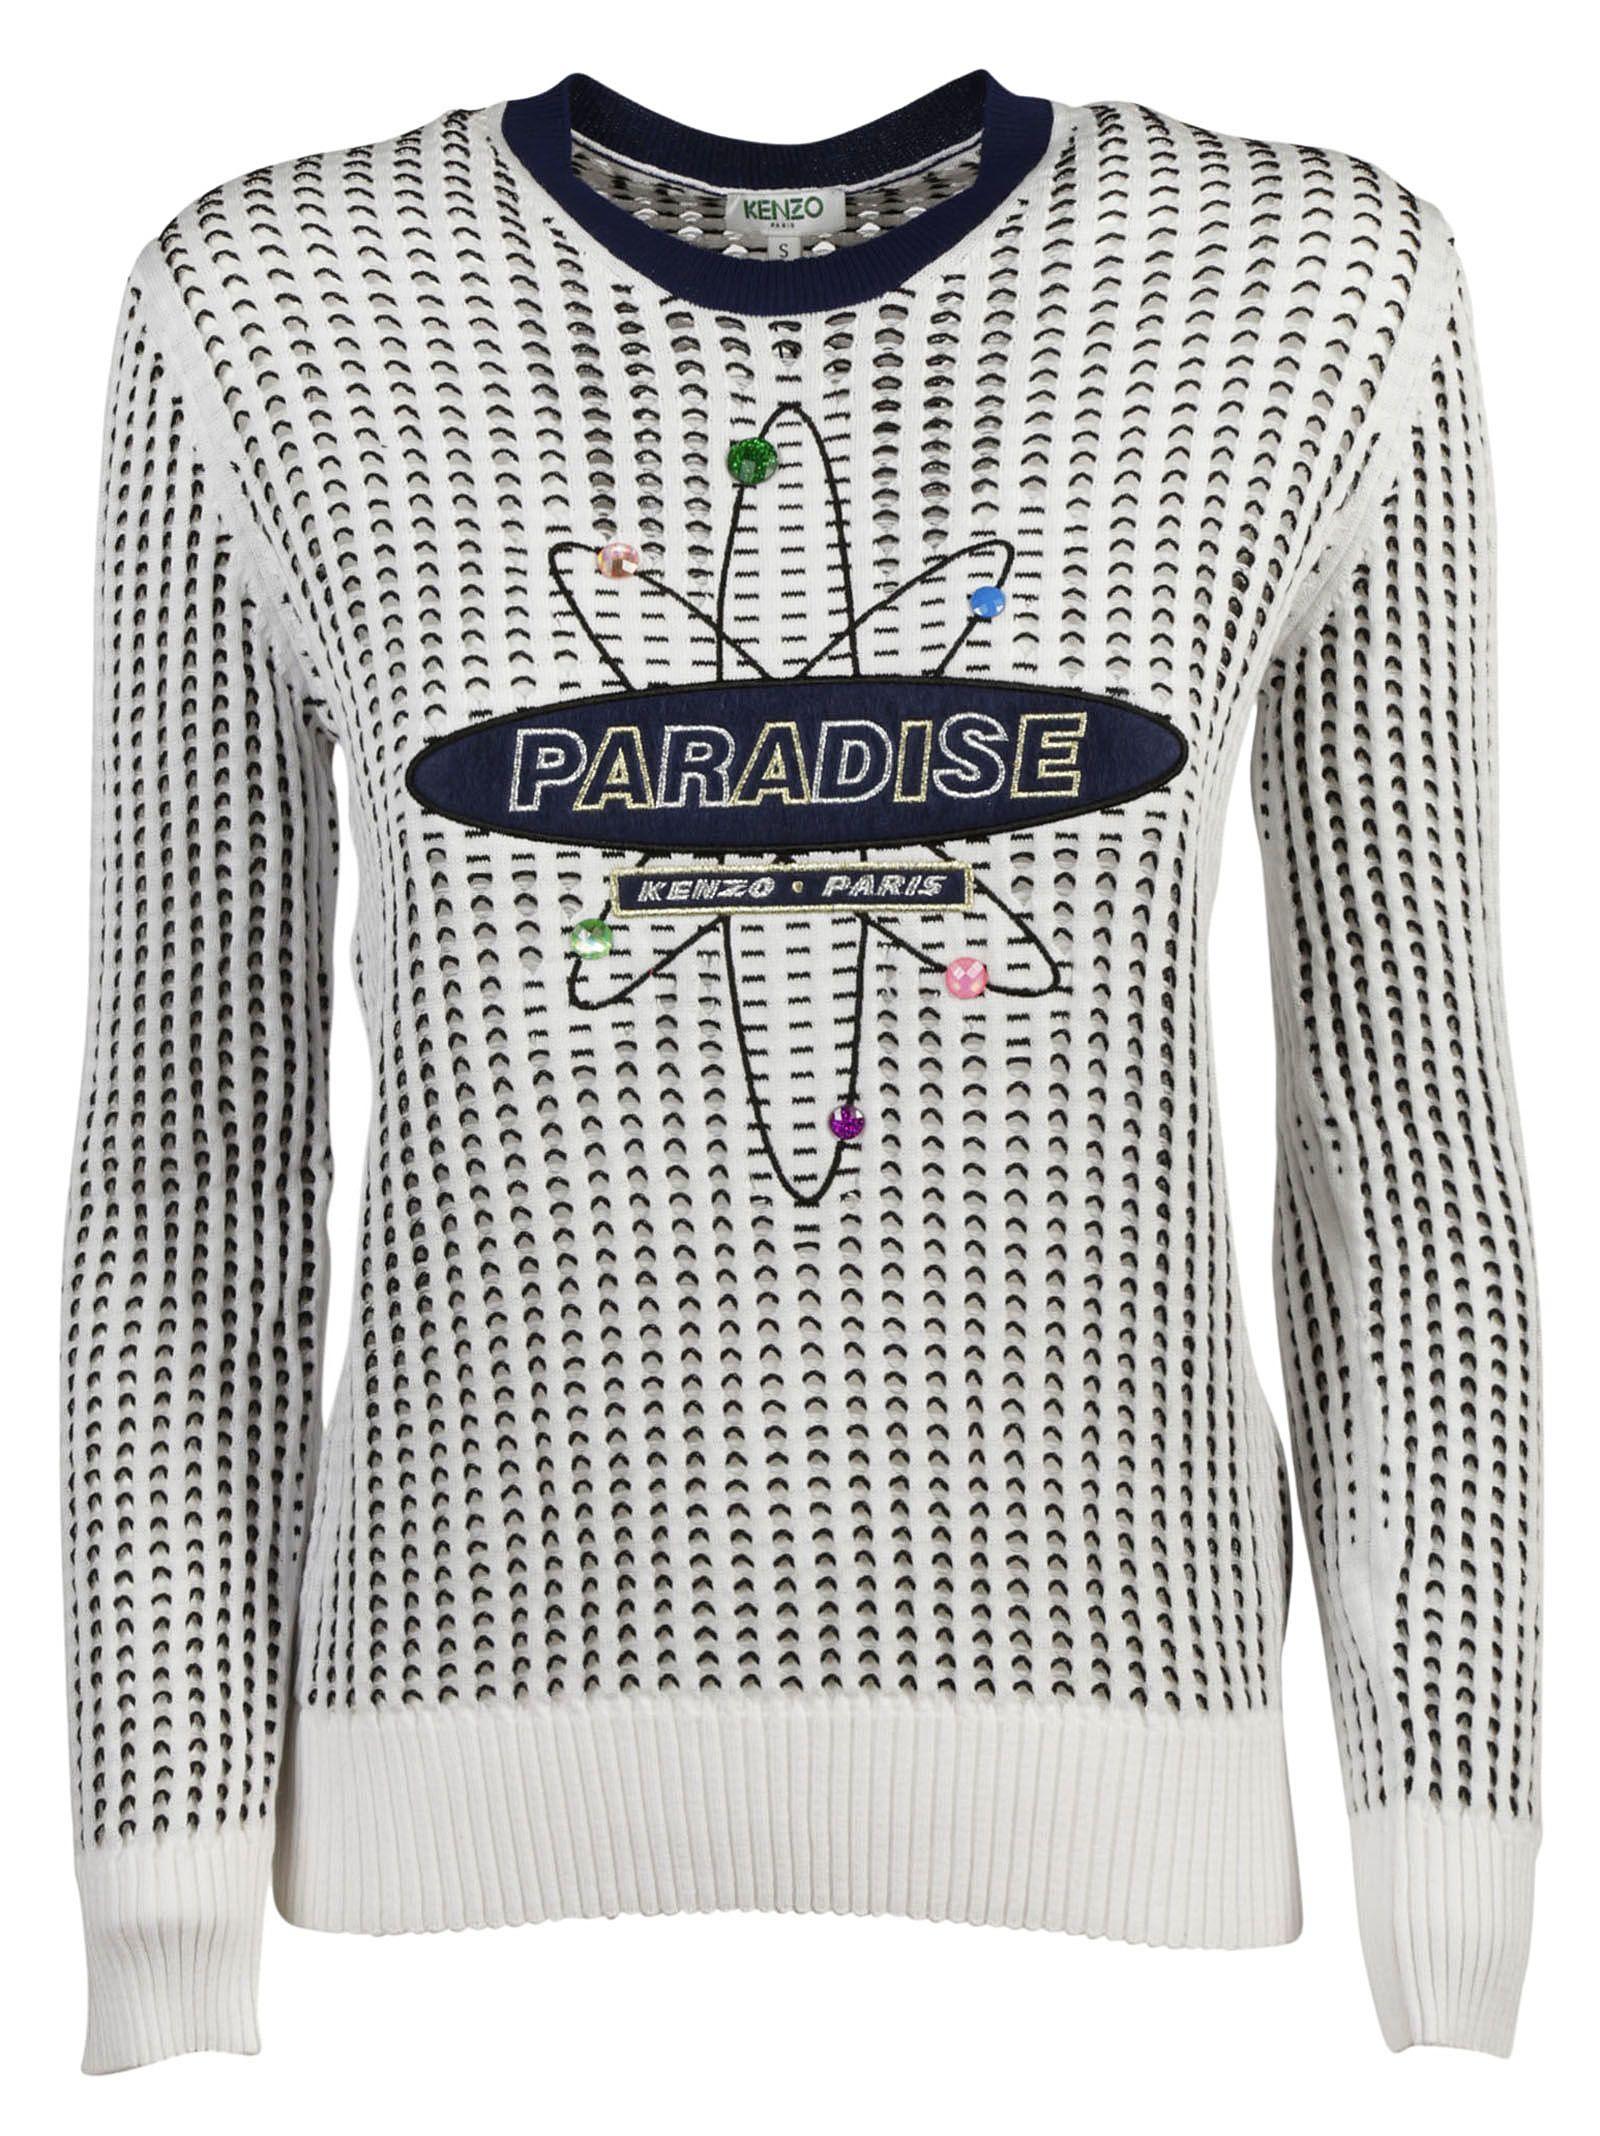 Kenzo Paradise Knitted Sweatshirt